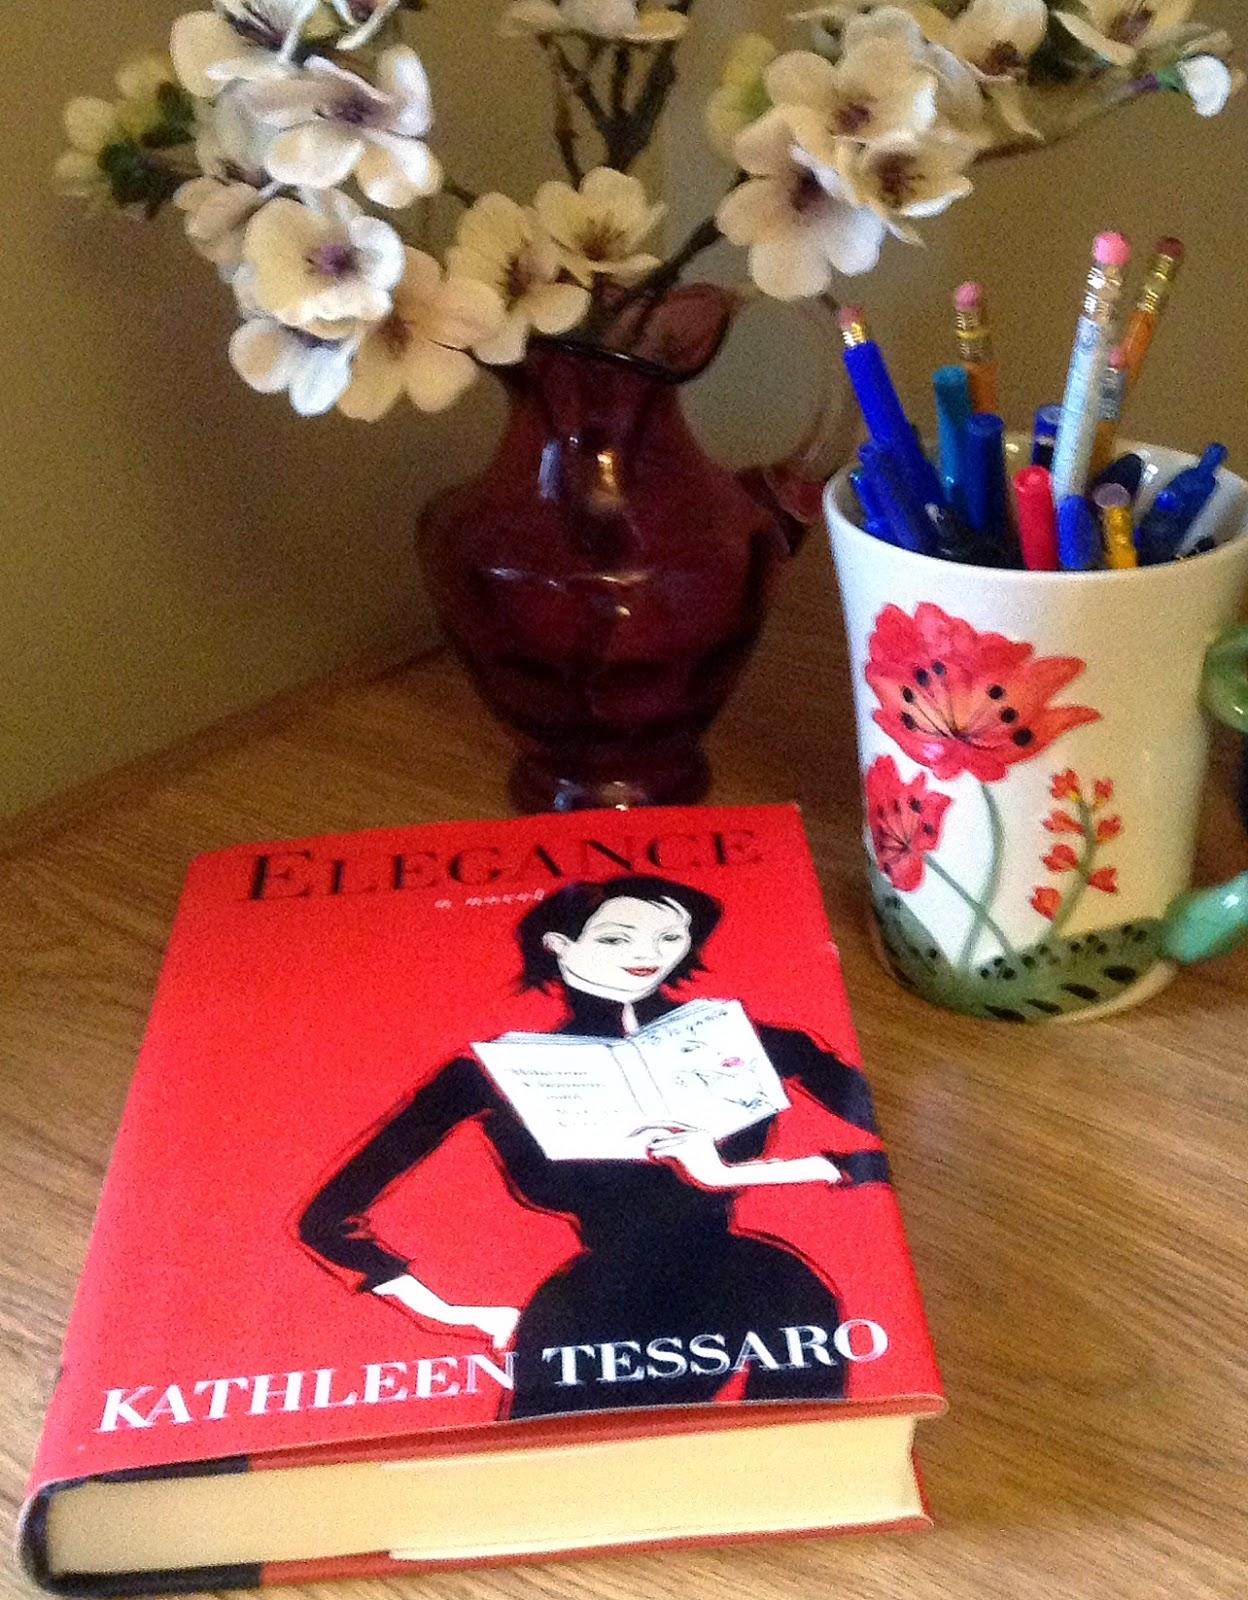 Kathleen Tessaro's book Elegance